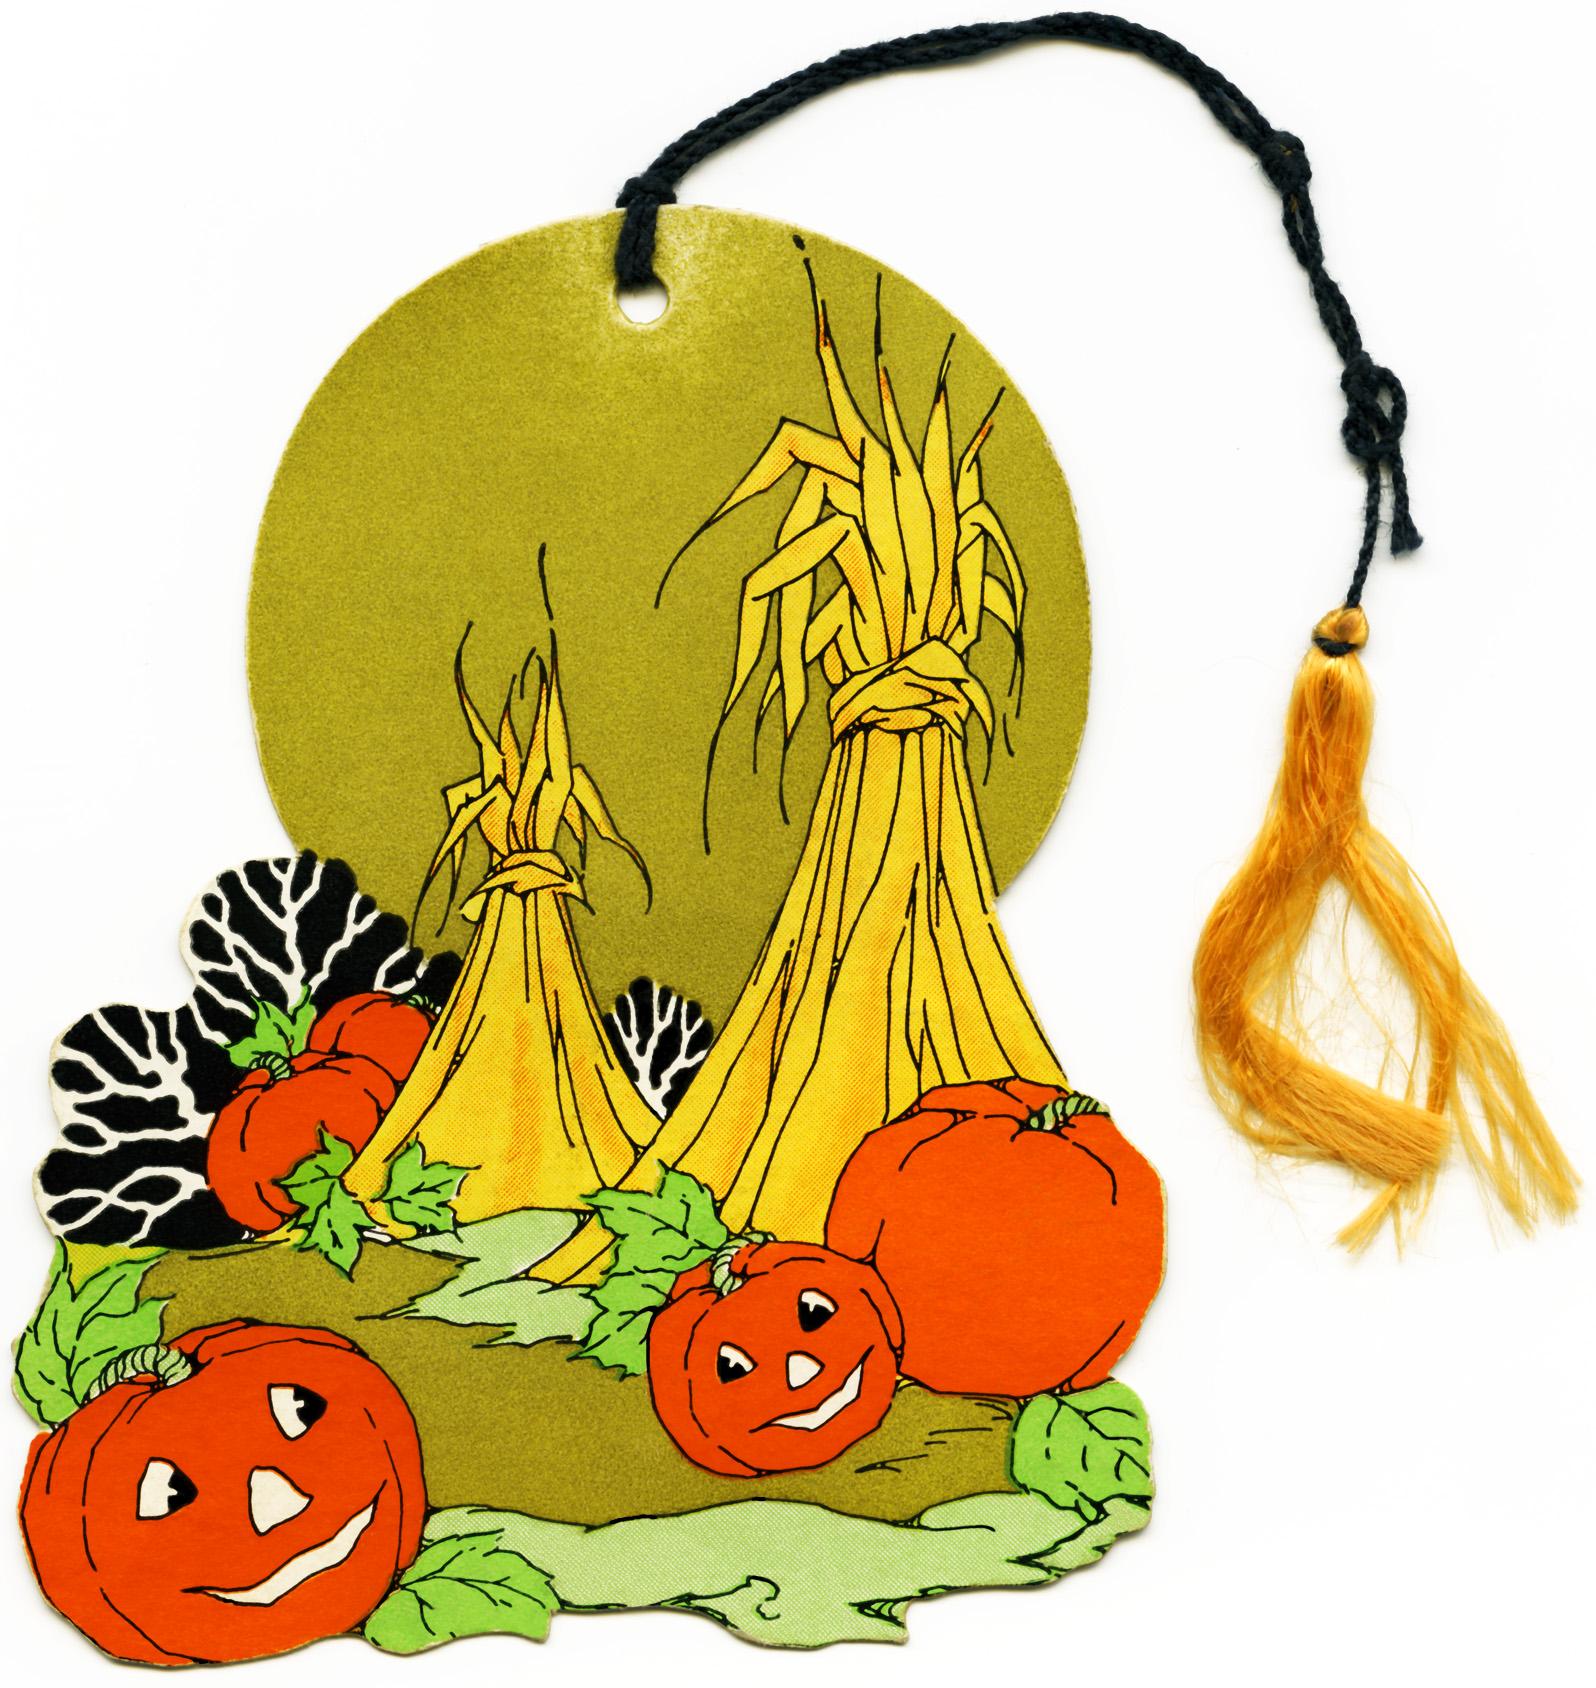 1596x1688 Pumpkins And Hay Stooks Clip Art Old Design Shop Blog